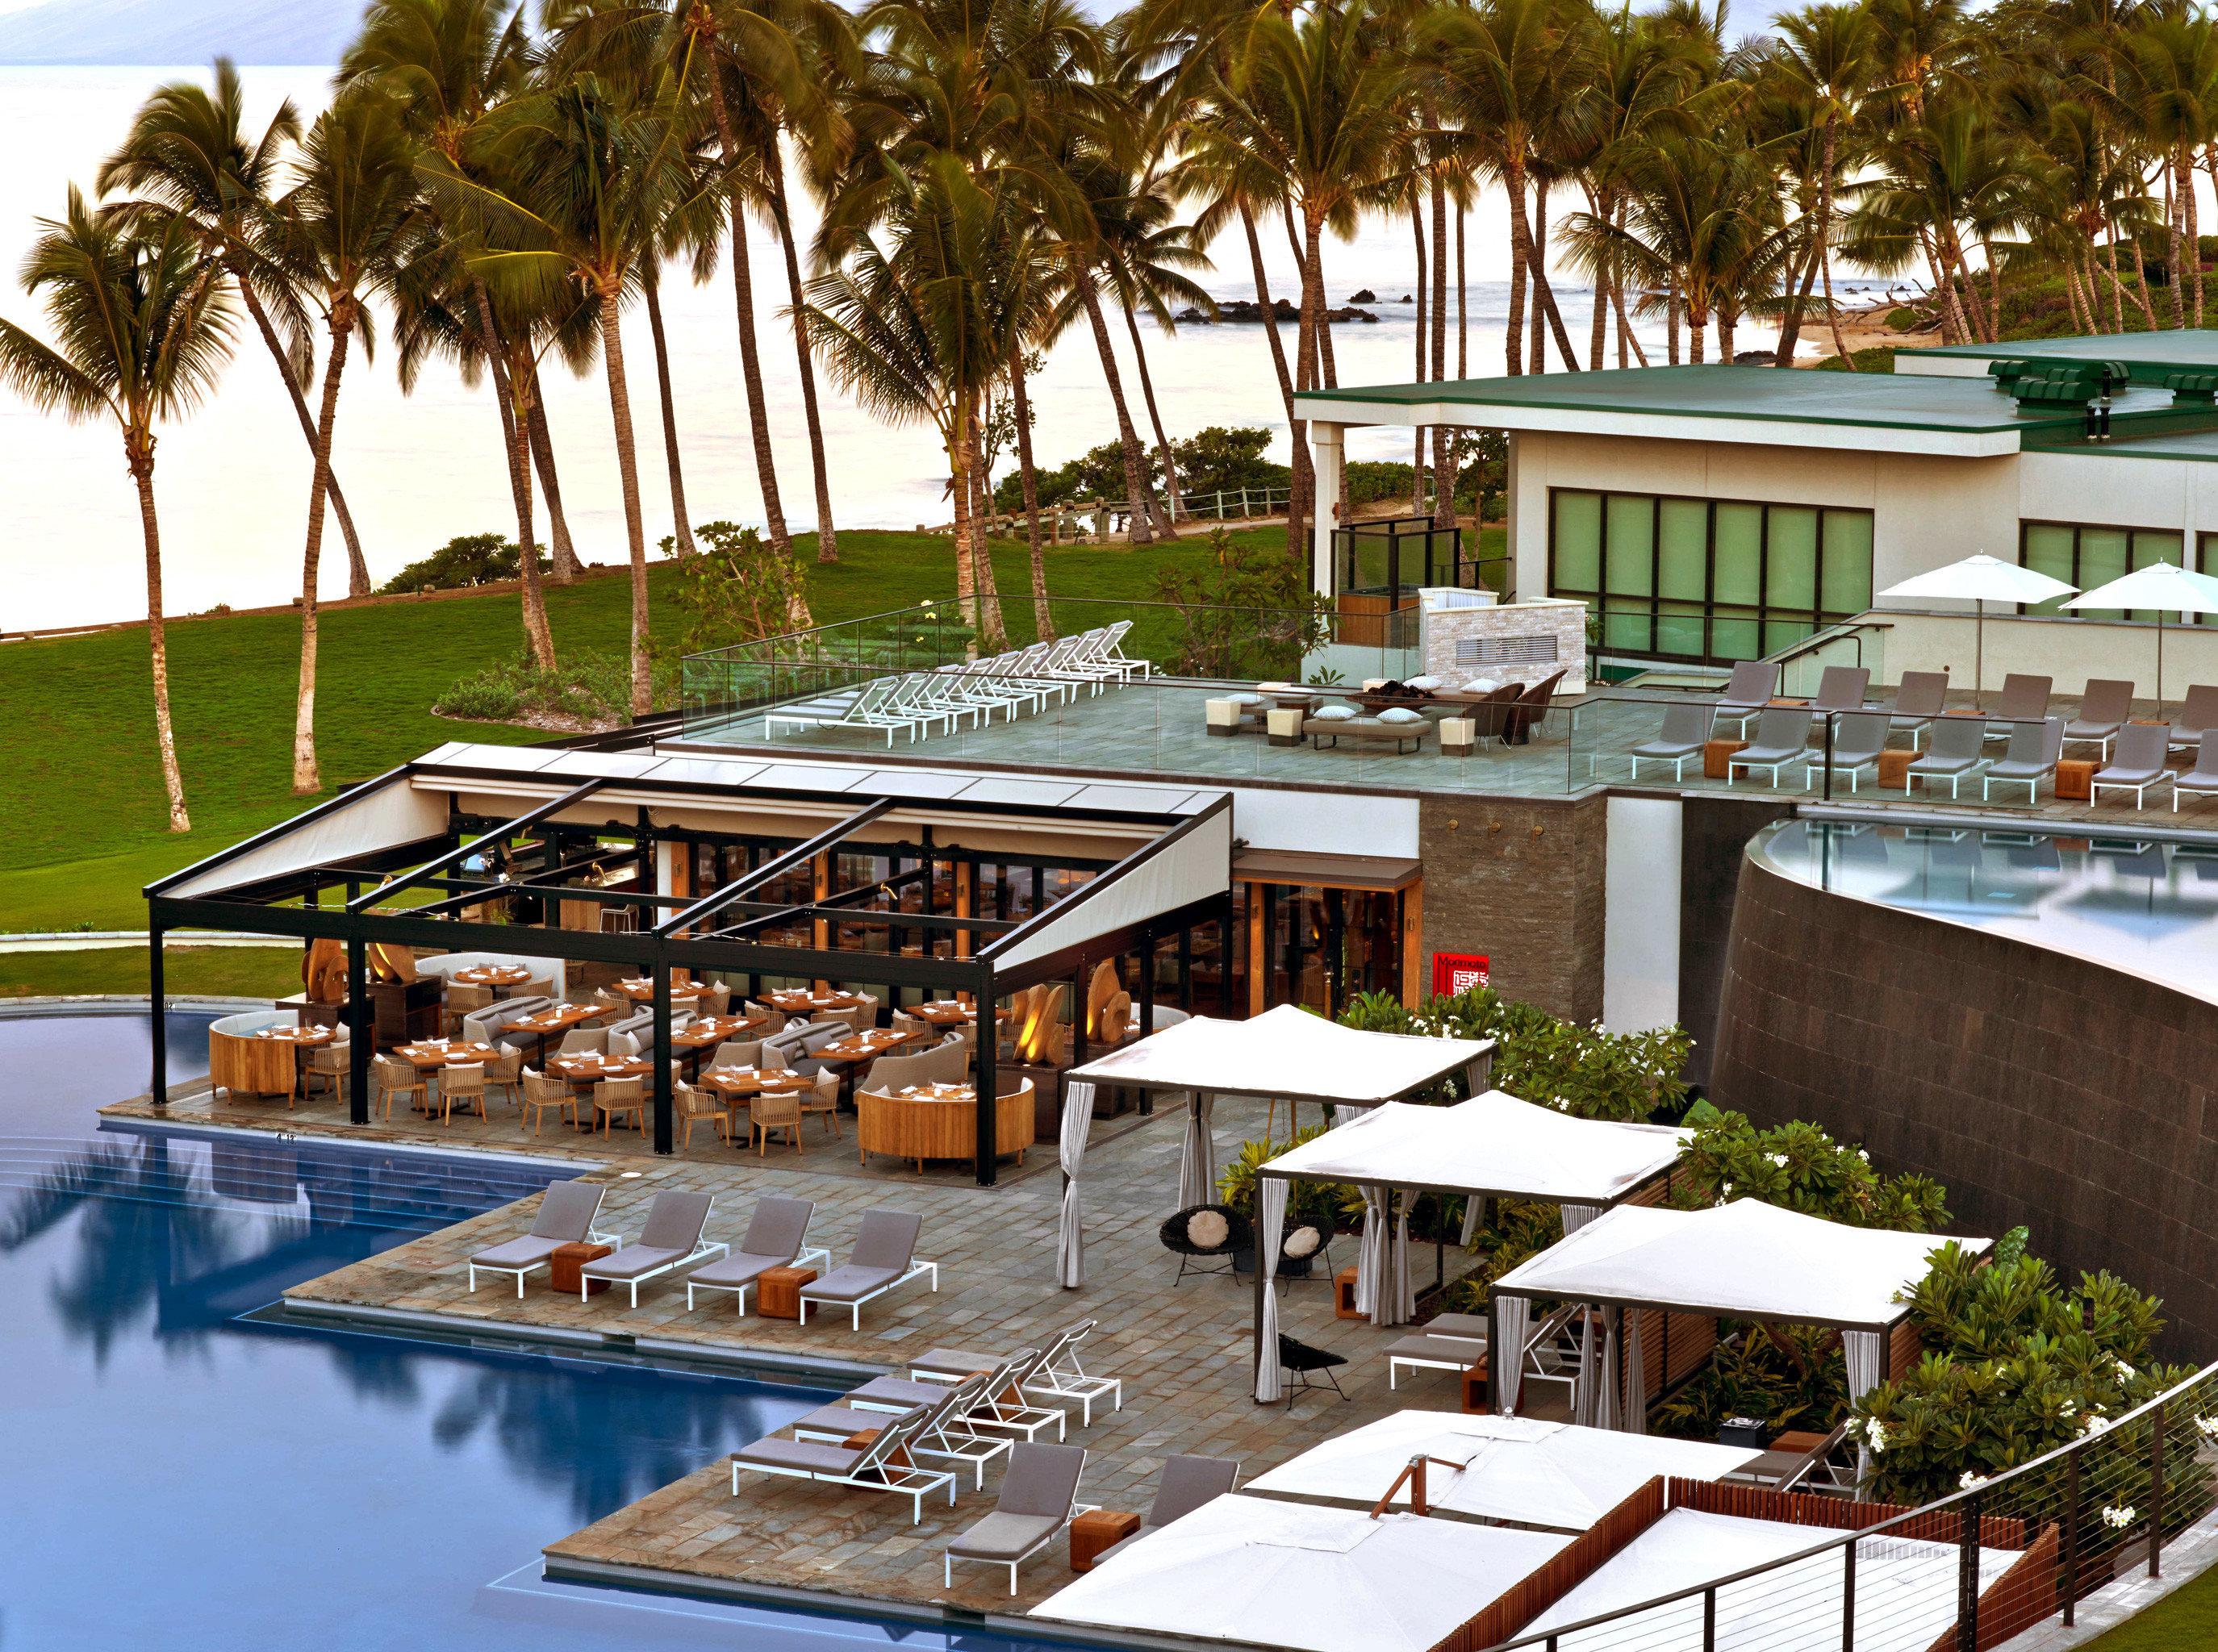 Exterior Grounds Honeymoon Hotels Luxury Pool Romance Romantic tree outdoor table leisure Resort swimming pool estate vacation restaurant dock plaza marina condominium Villa